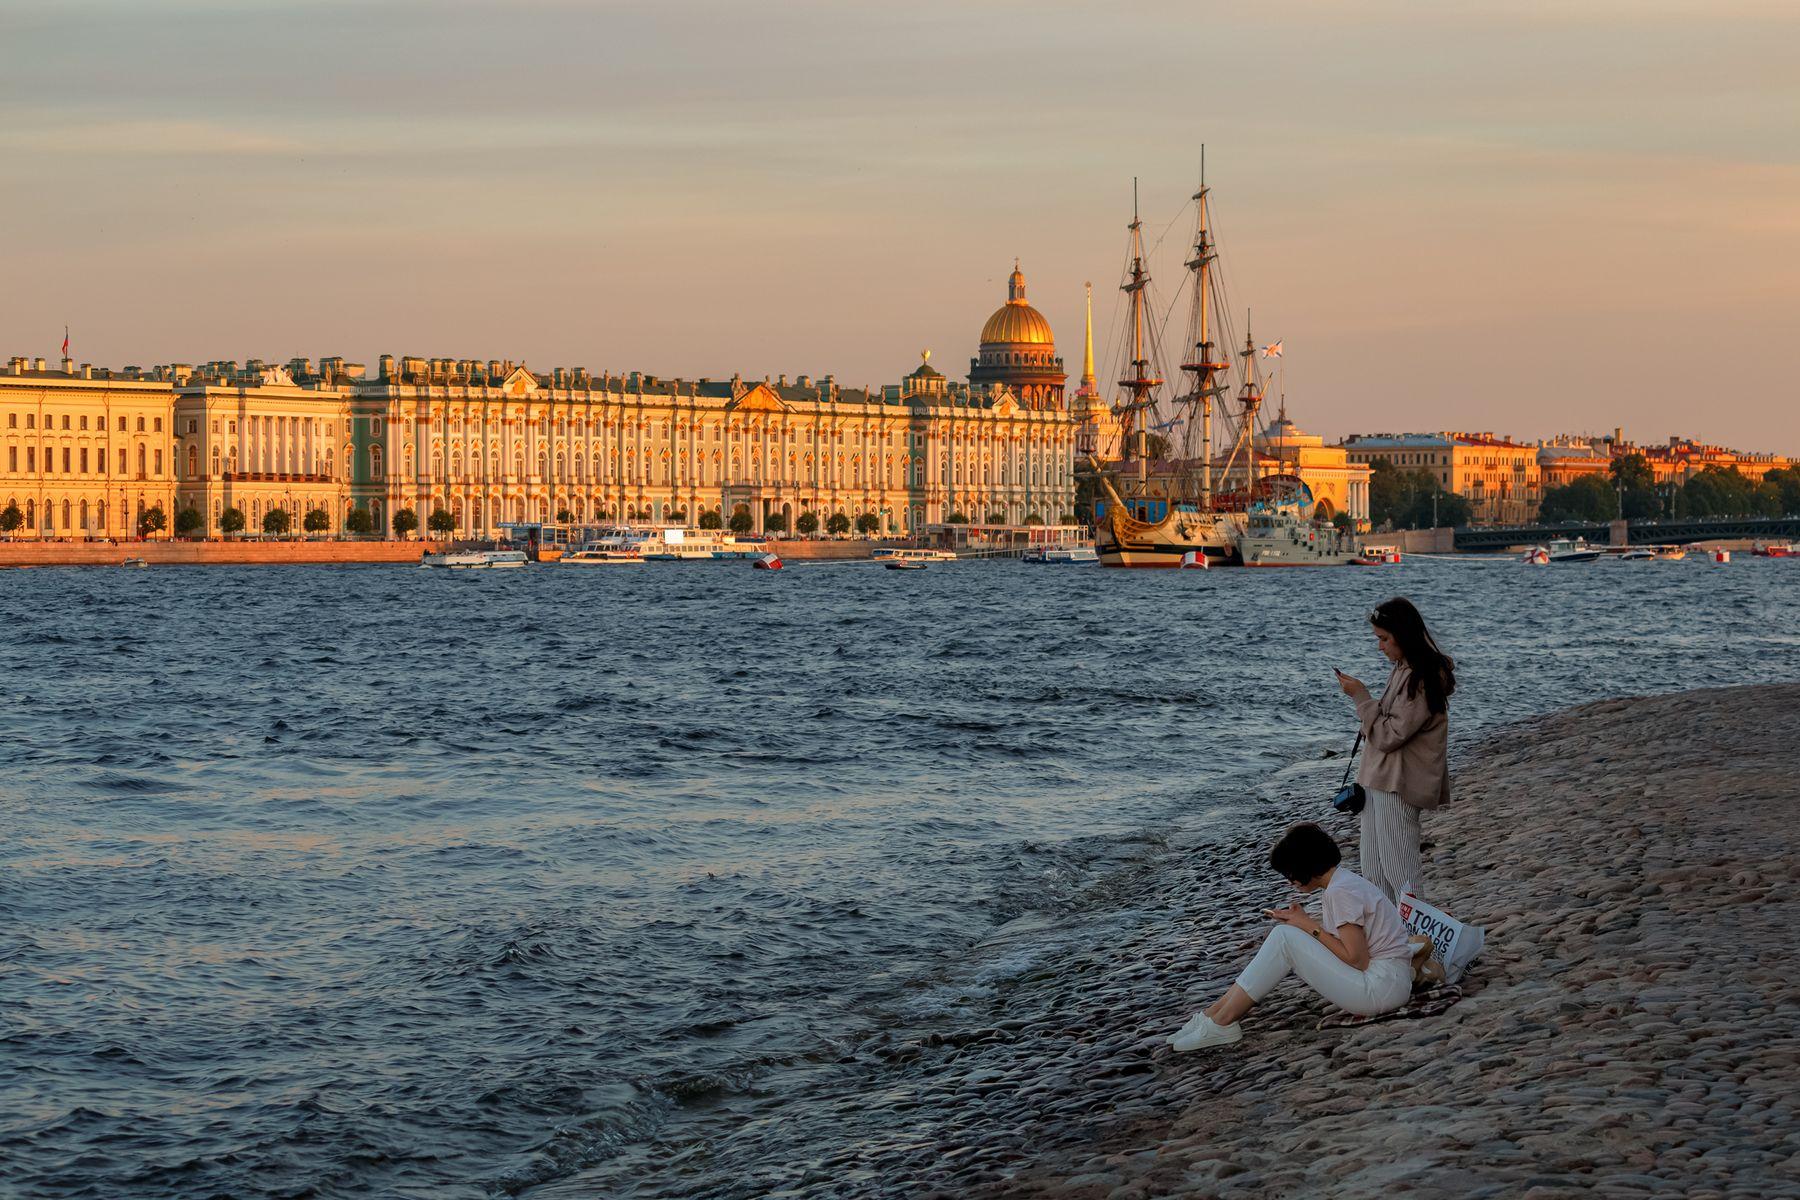 Июльский летний вечер Санкт-Петербург вечер река девушки парусник Нева берег